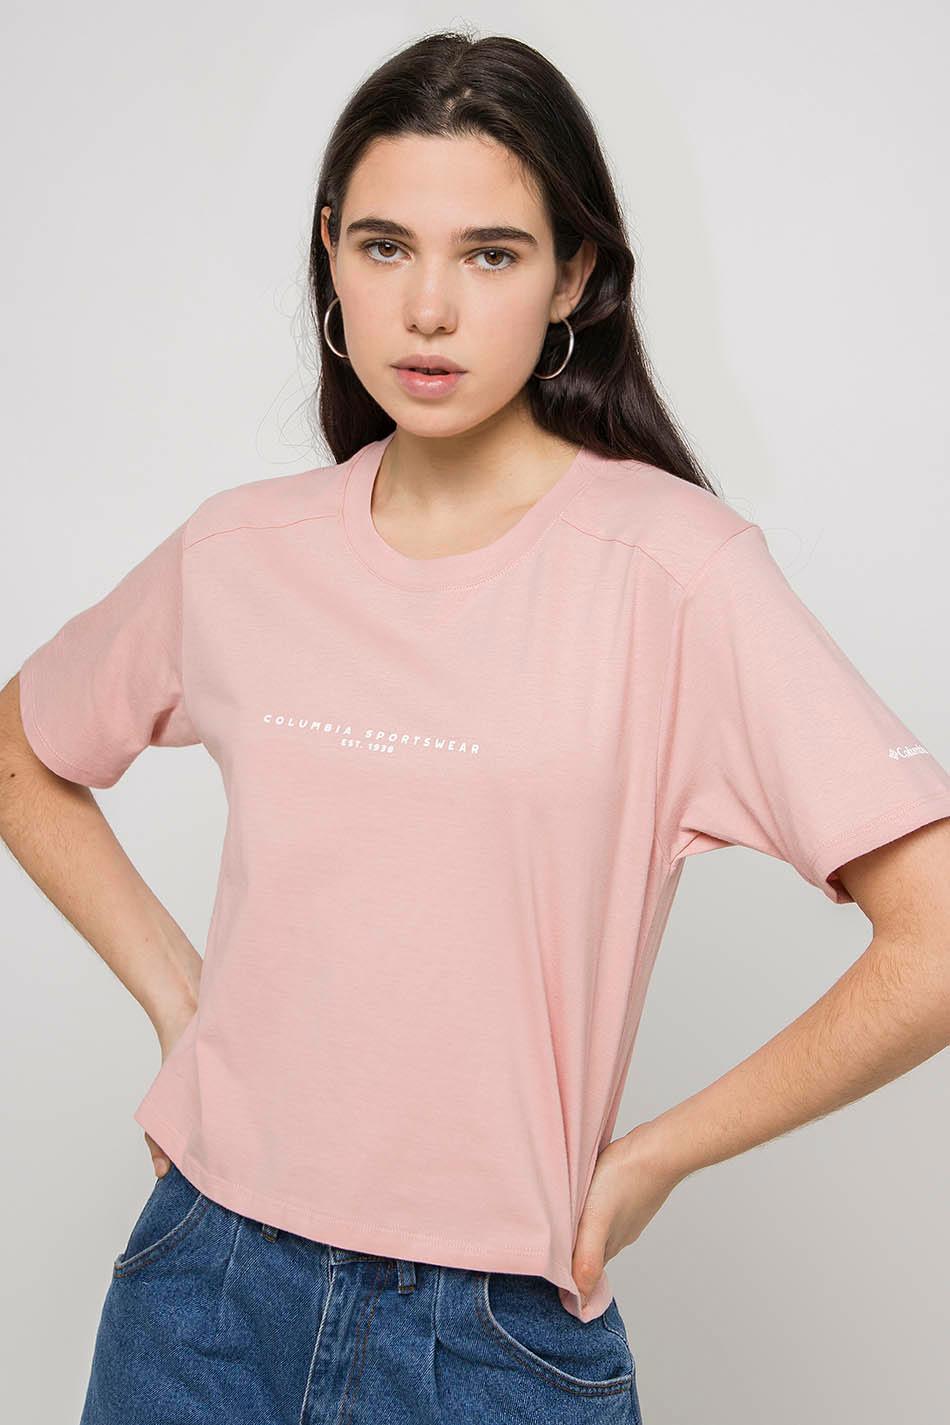 Columbia Park Box Pink T-shirt